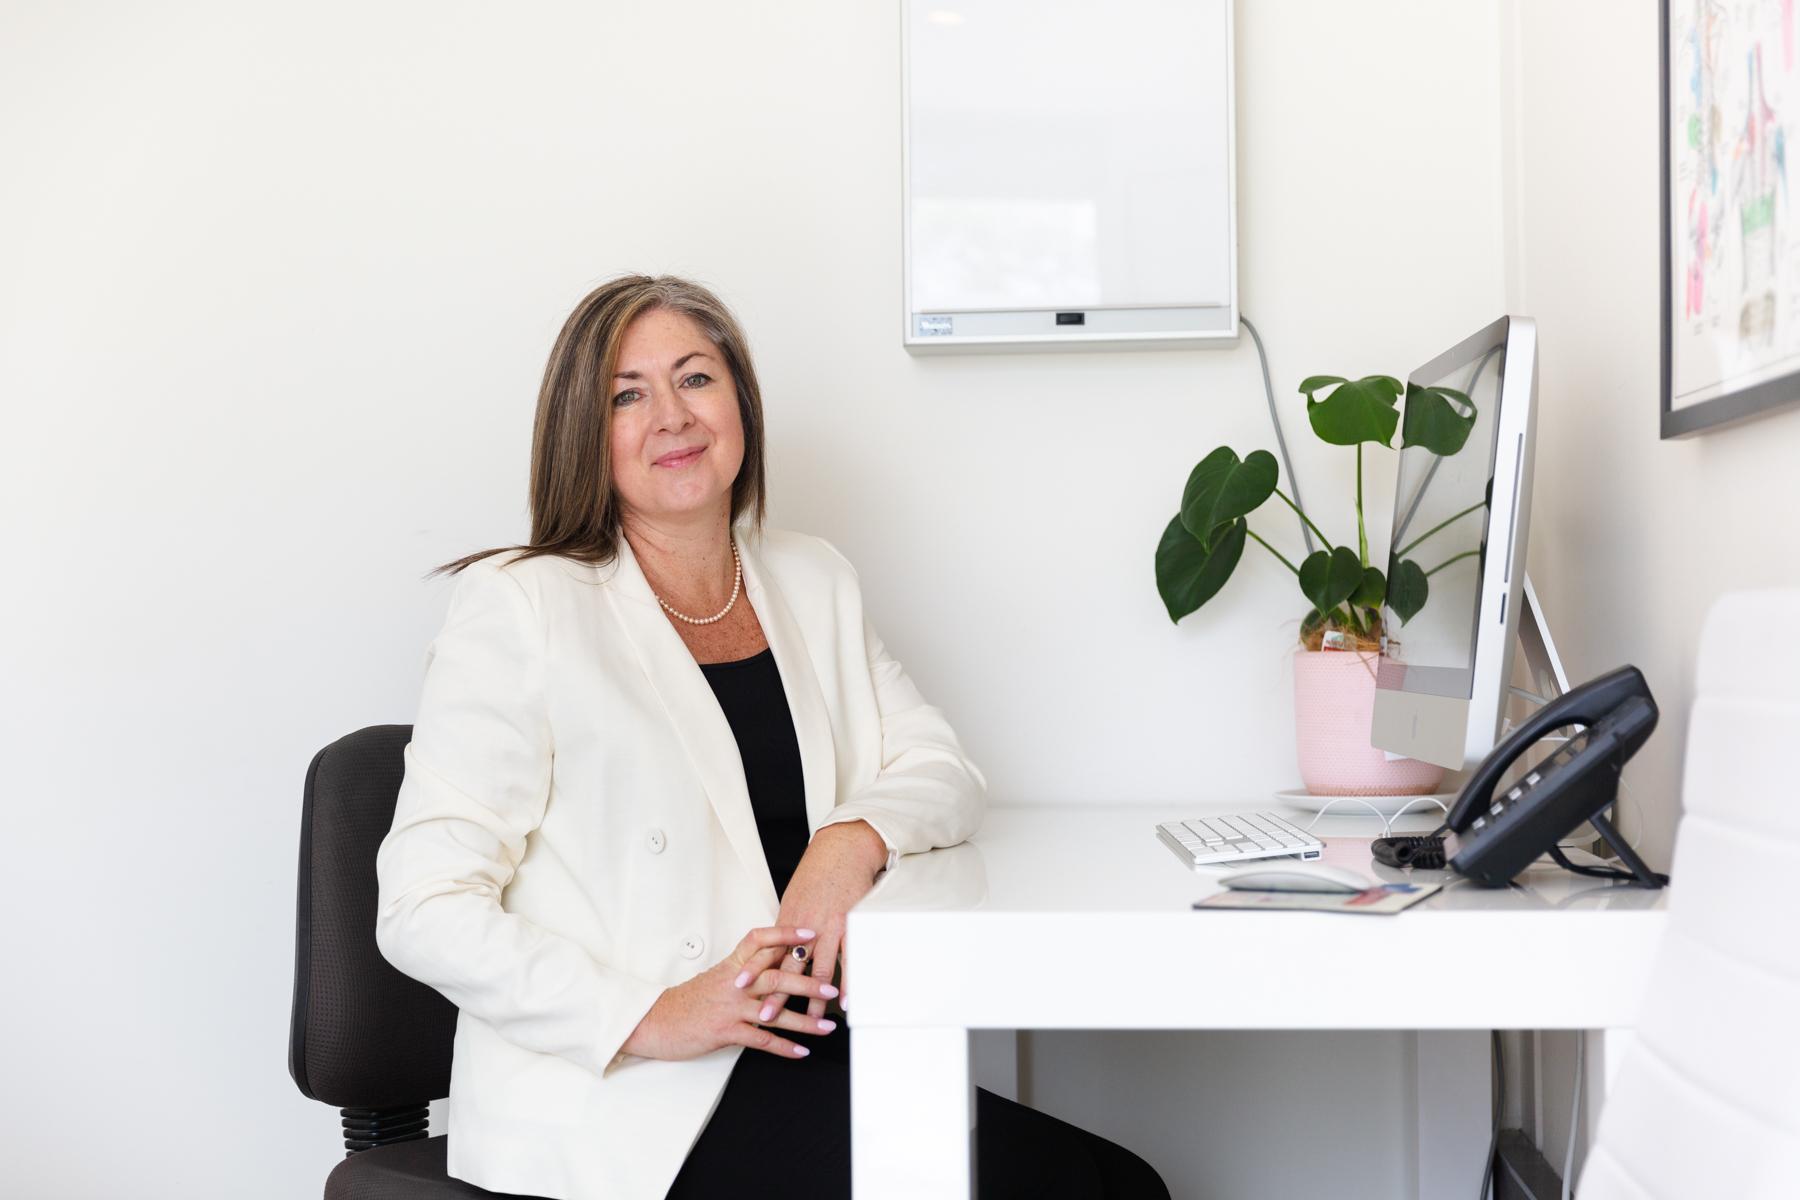 Sonya Lee (Hypnotherapist and Naturopath)